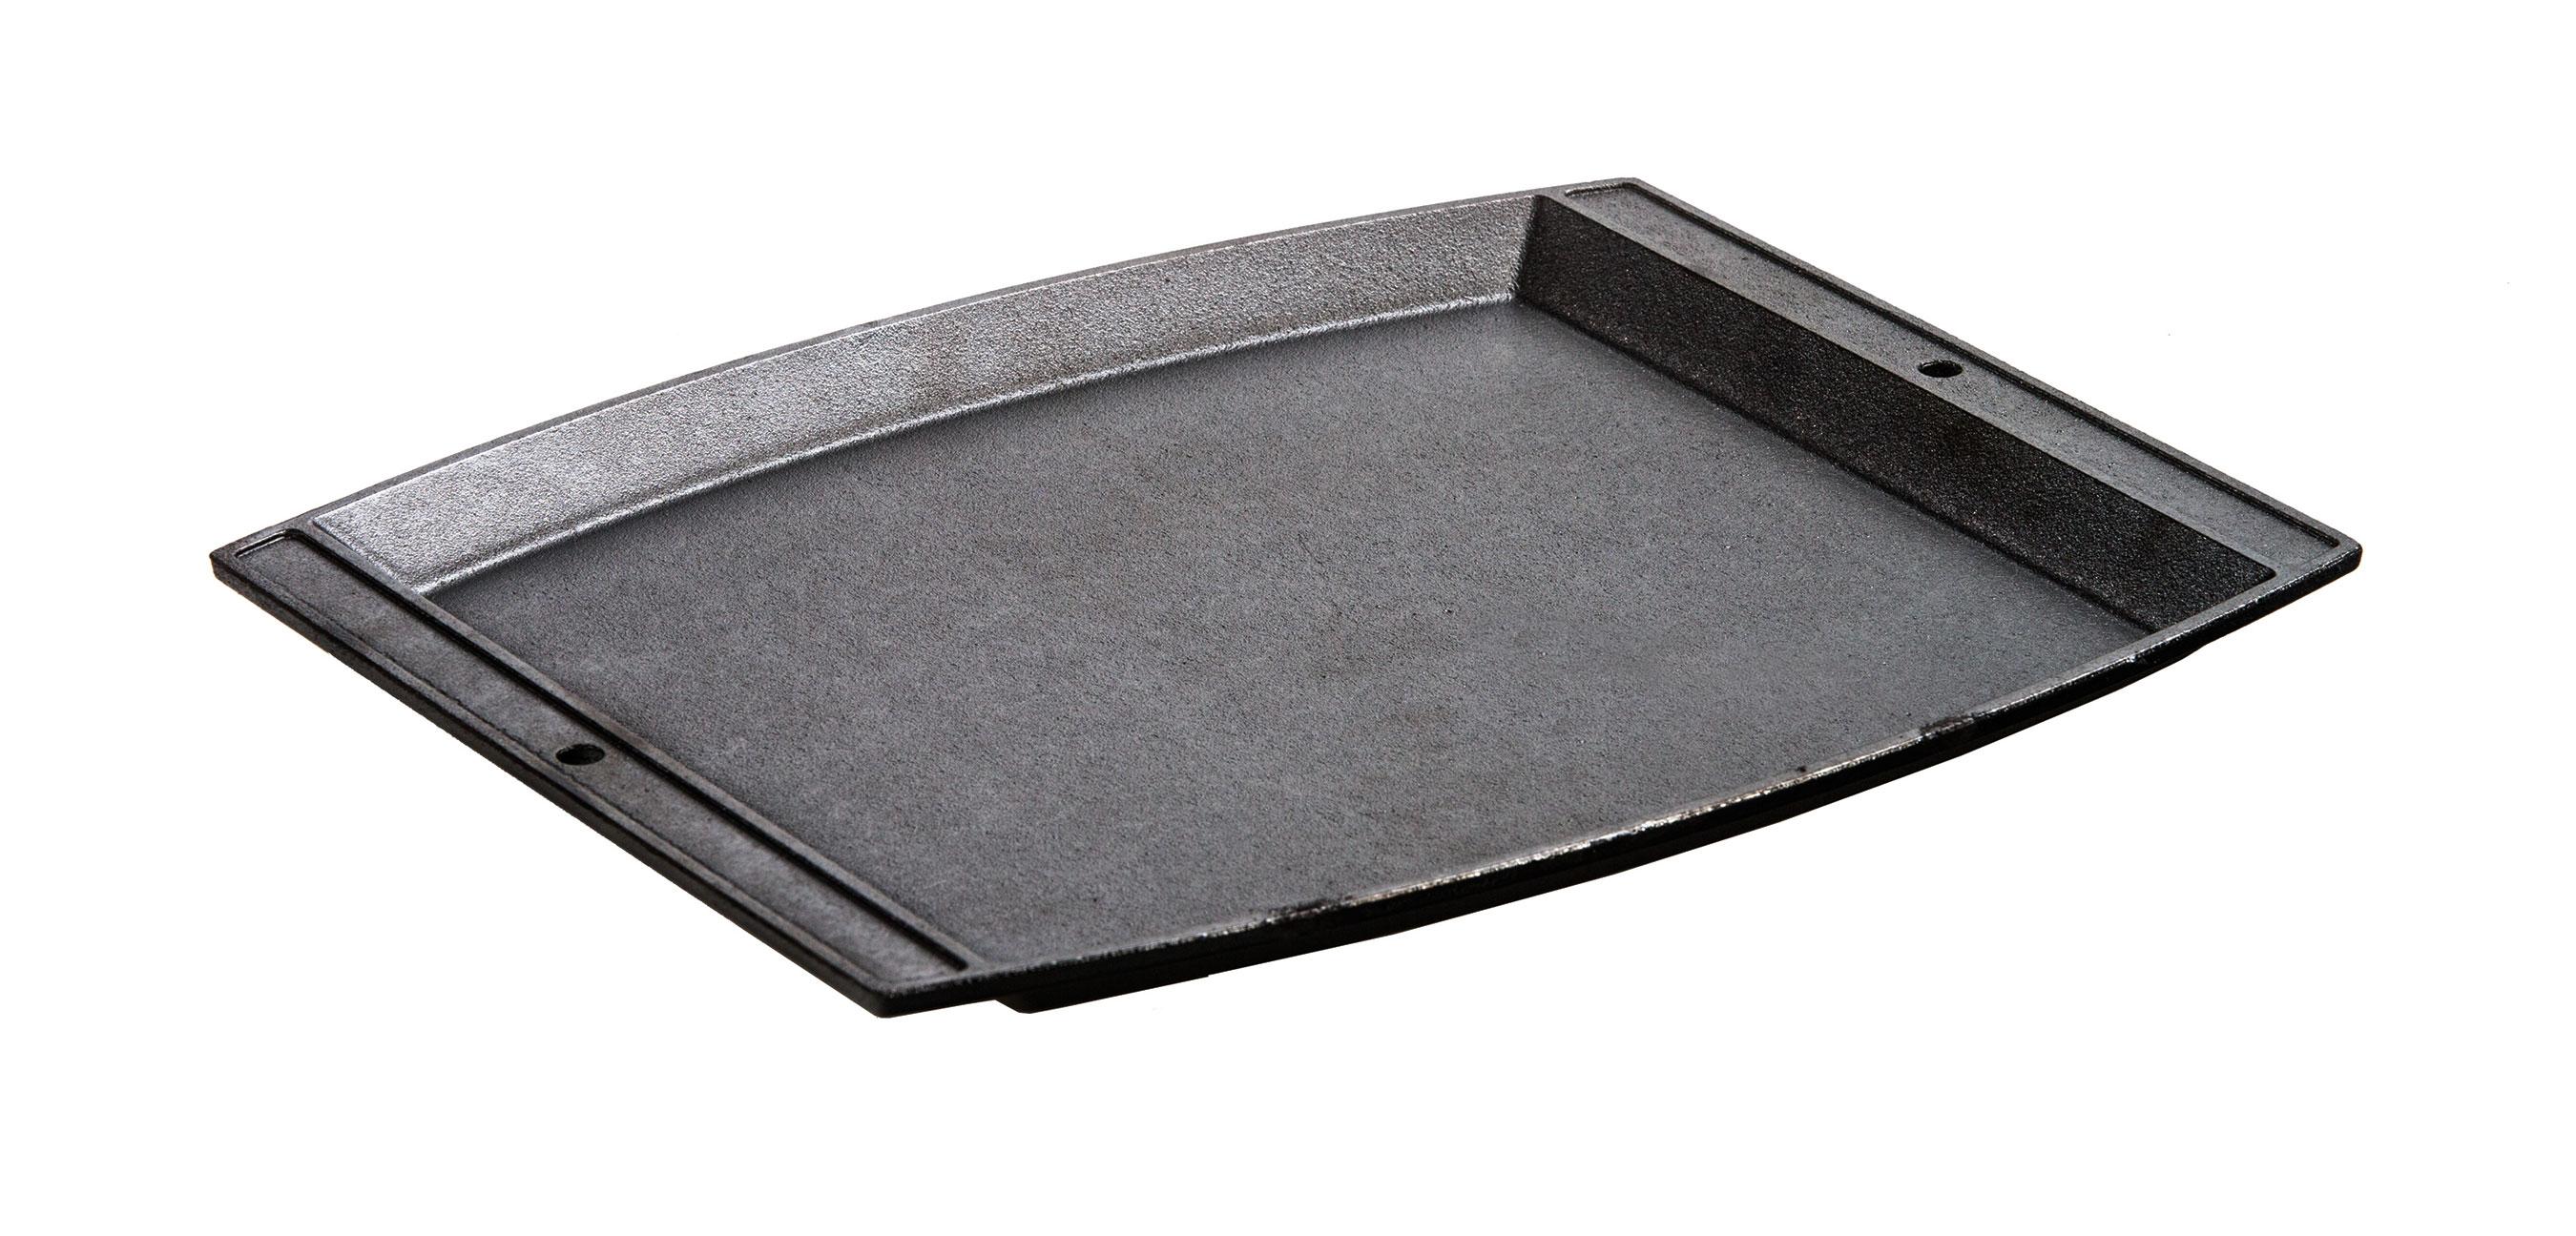 Lodge Cast Iron Chef´s Platter / Grillplatte Gusseisen Bild 1